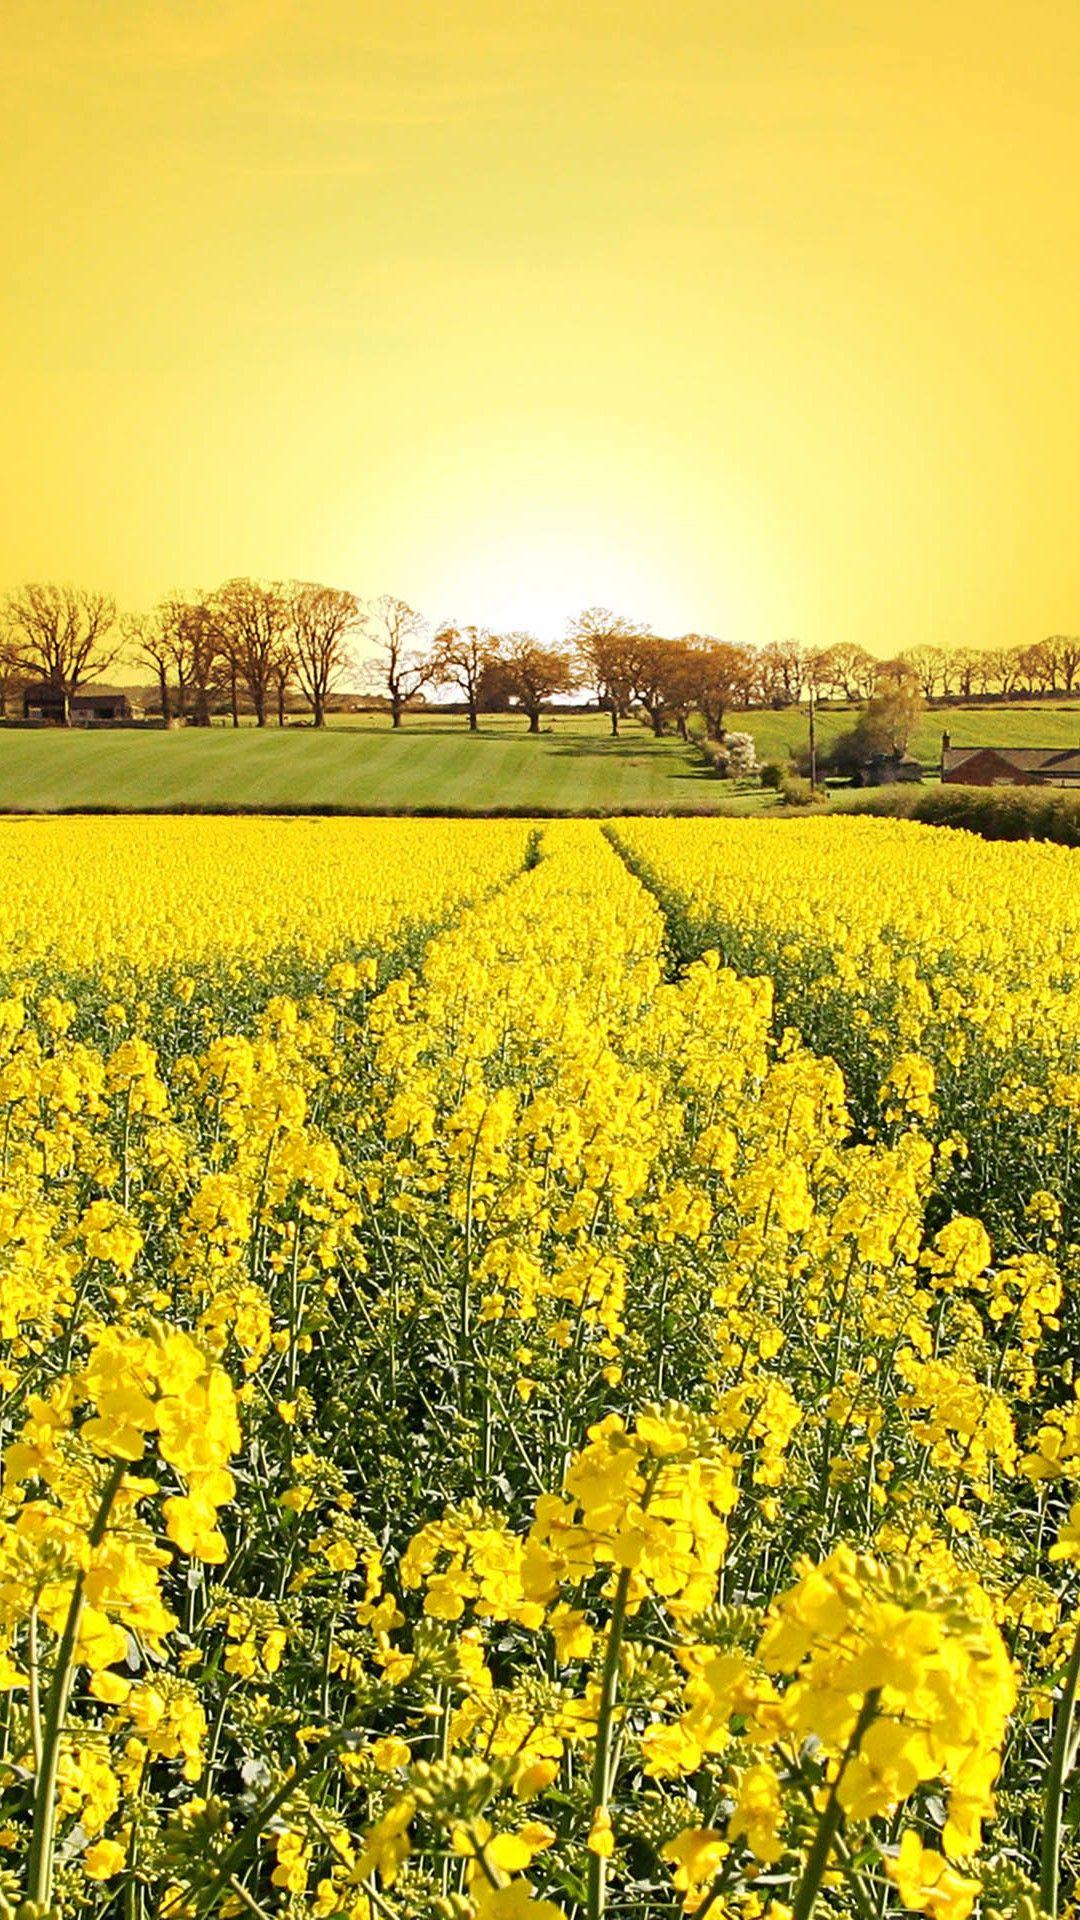 Golden Canola Flowers Iphone 6 Plus Wallpaper Iphone 6